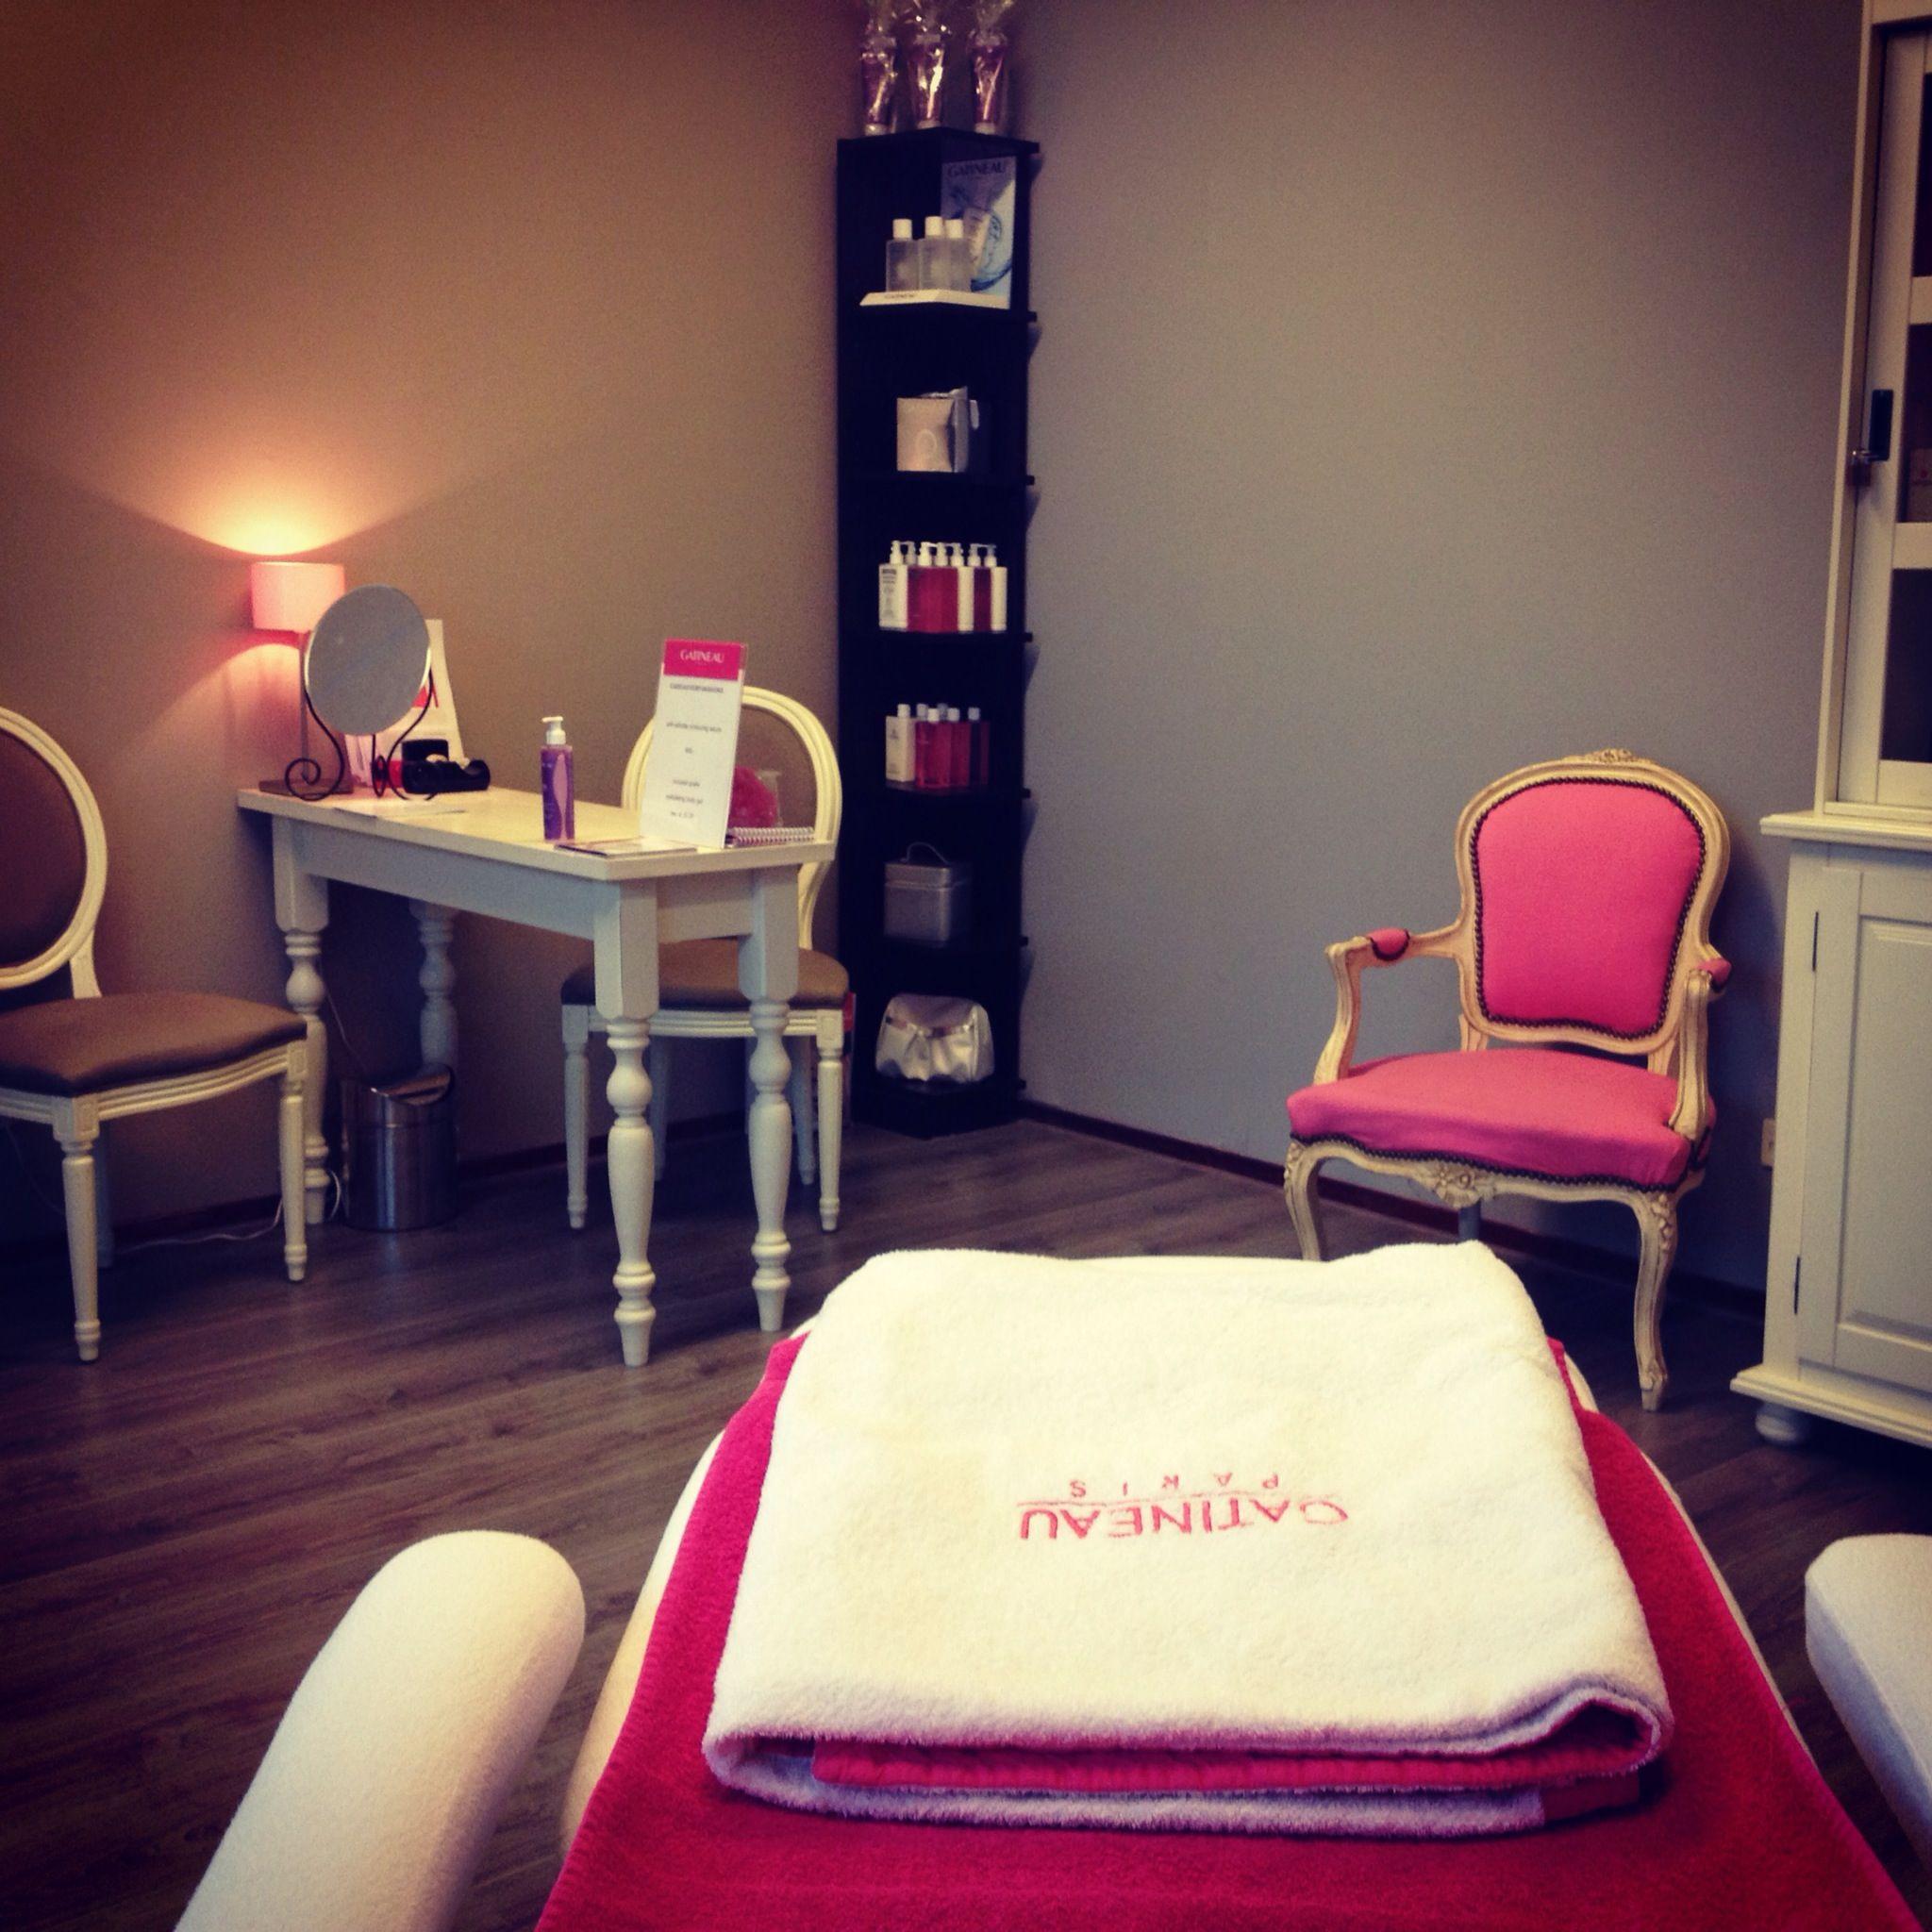 beauty salon nail salon pinterest nagelstudio deko. Black Bedroom Furniture Sets. Home Design Ideas